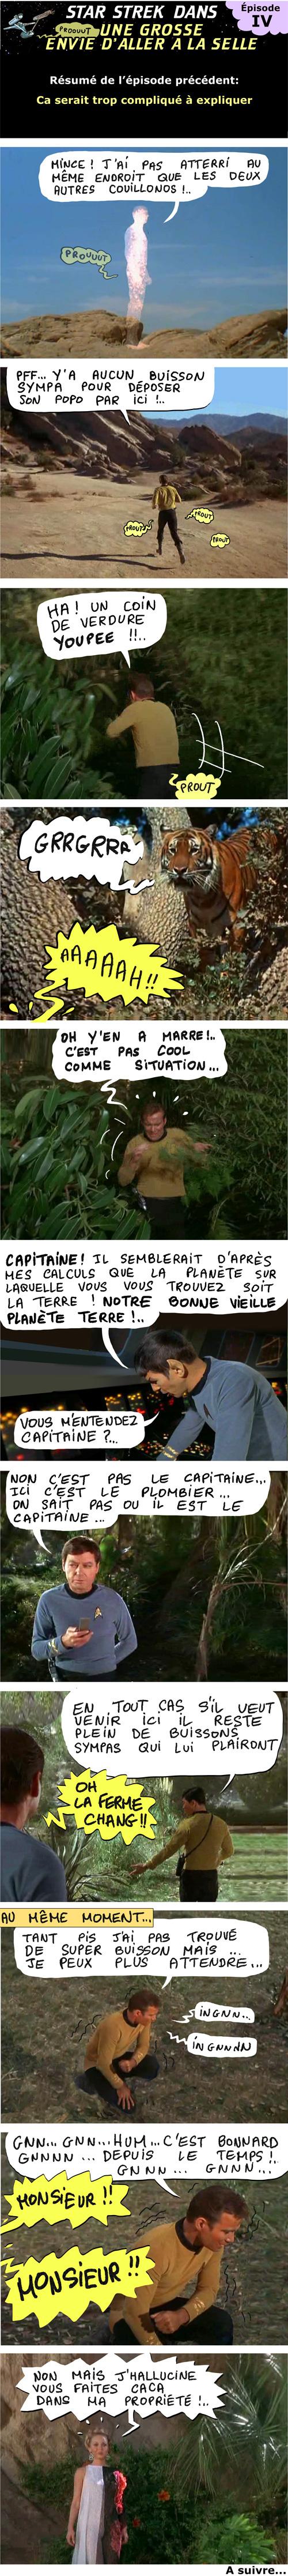 star trek - capitaine kirk fait caca 4